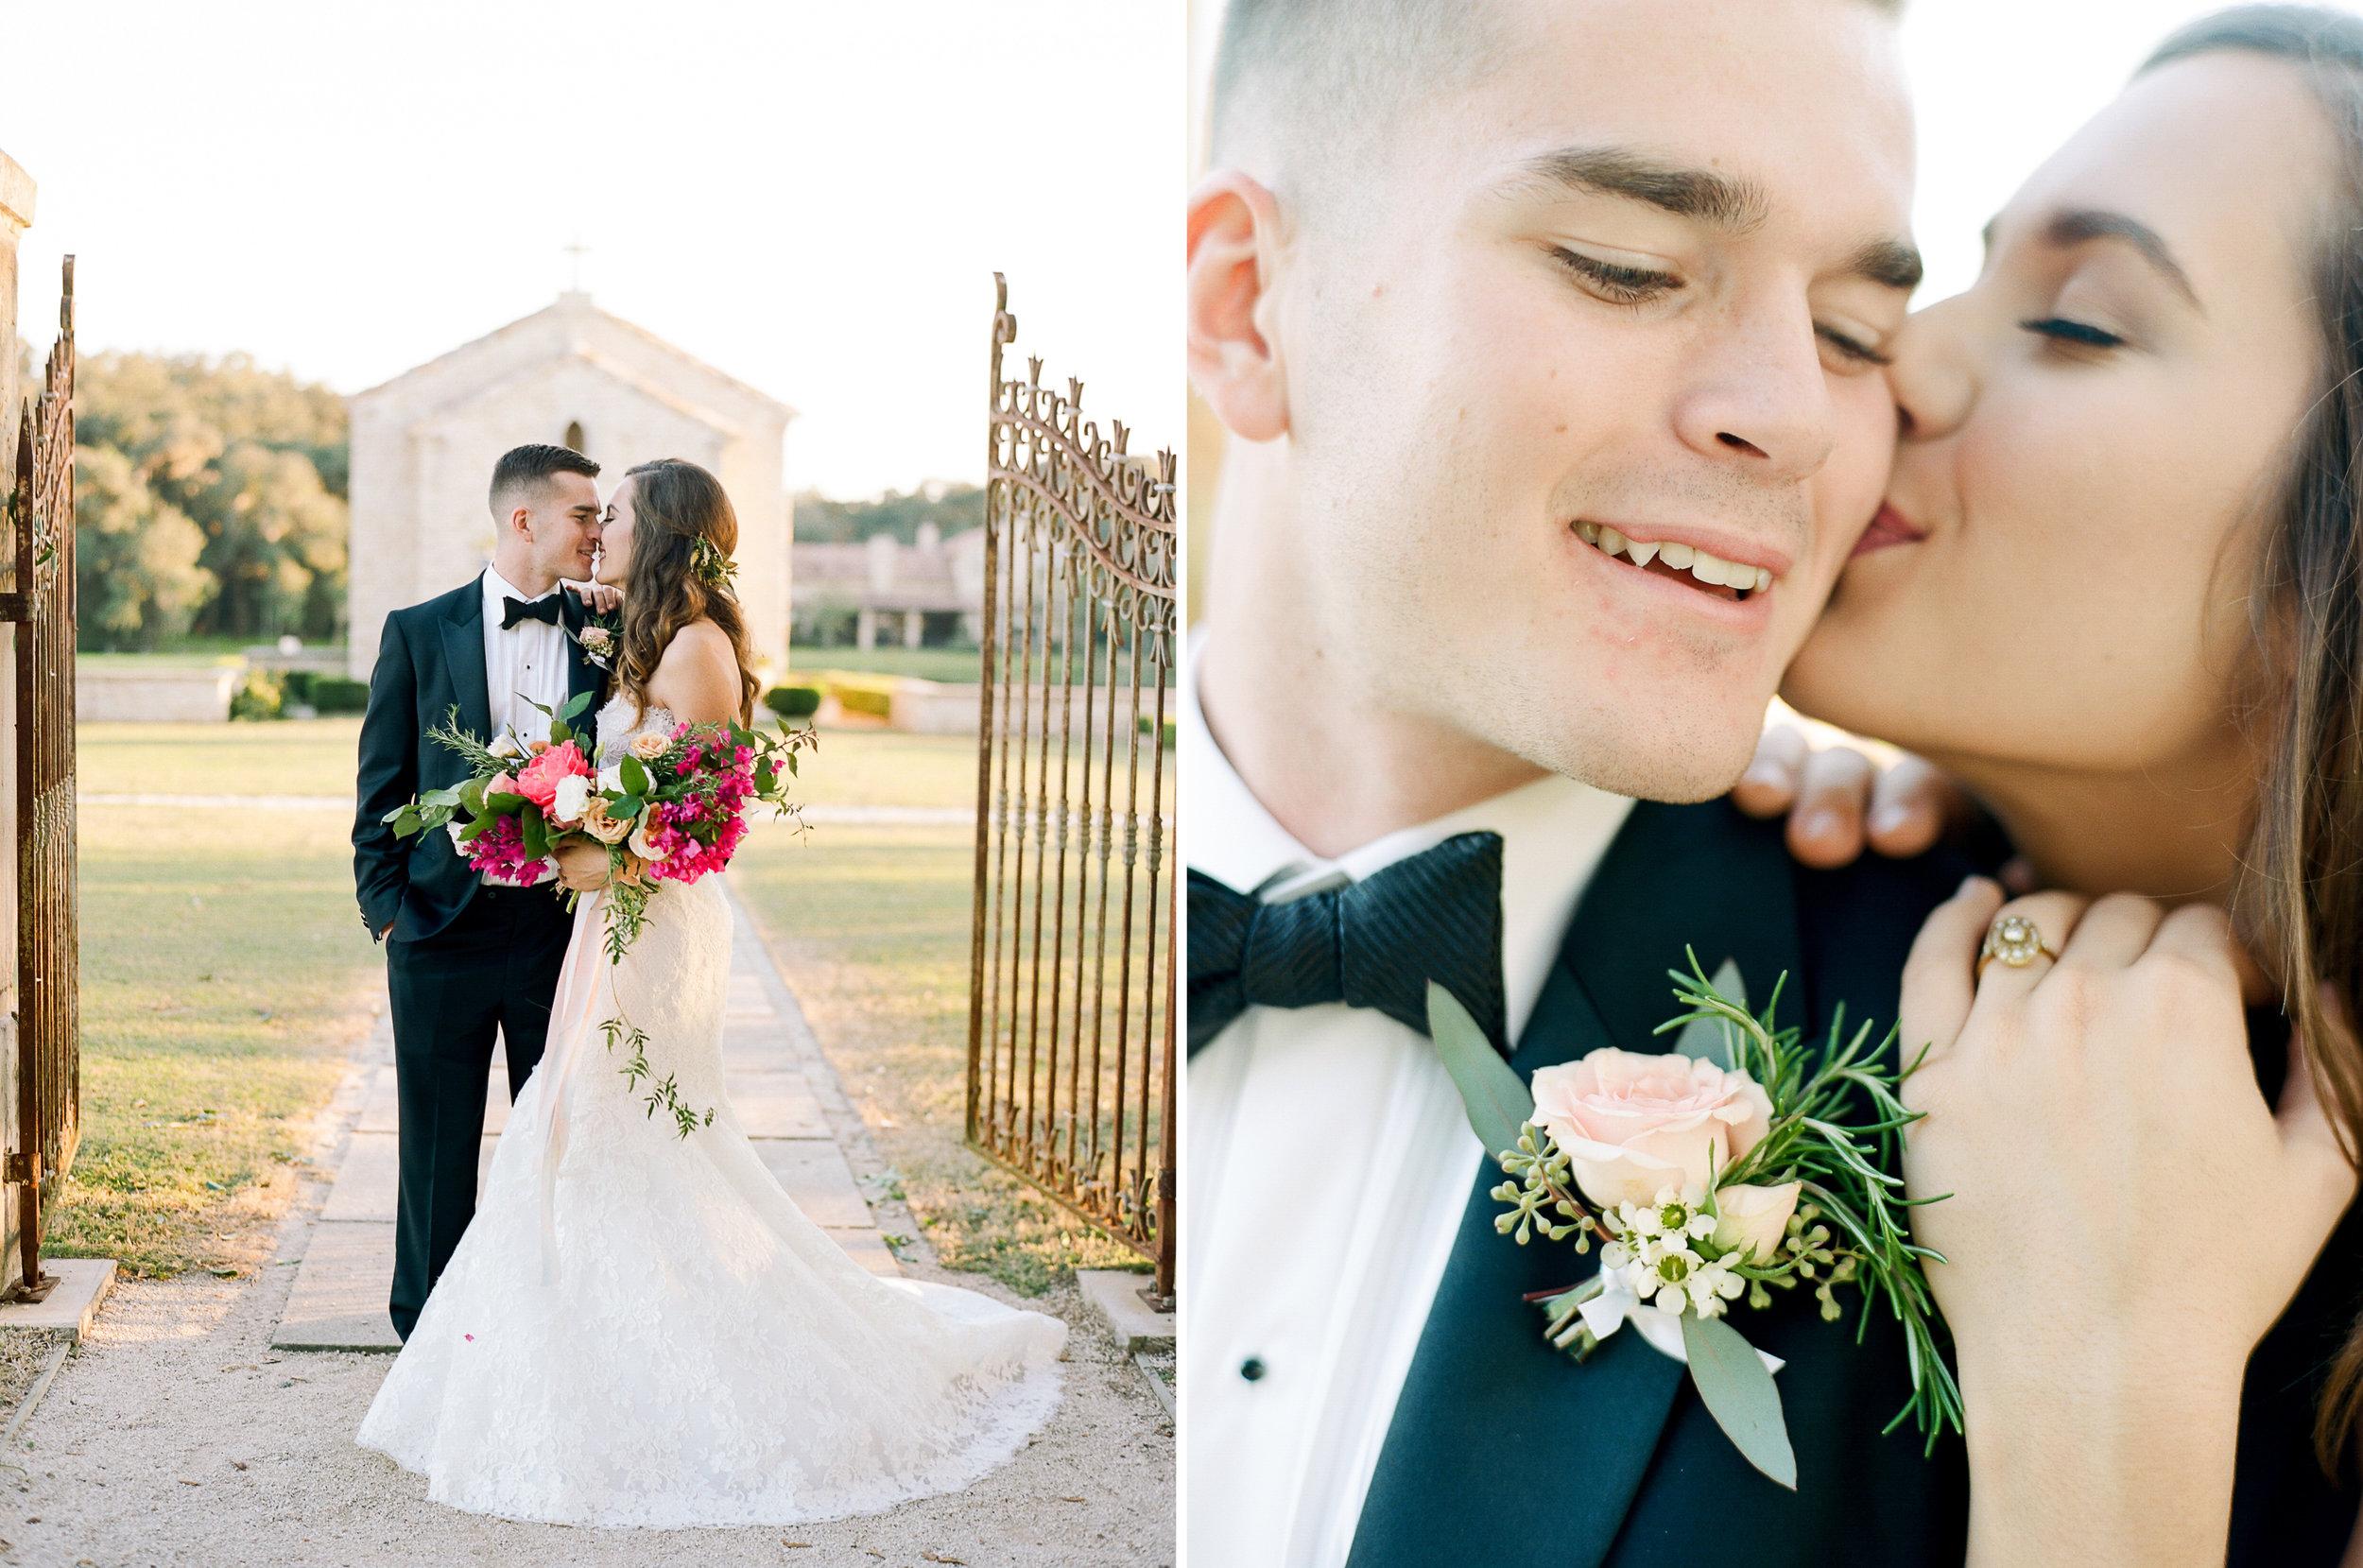 Top-Houston-Wedding-Photographer-Dana-Fernandez-Photography-The-Clubs-At-Houston-Oaks-Country-Club-Belle-Events-Film-Fine-Art-Destination-105.jpg